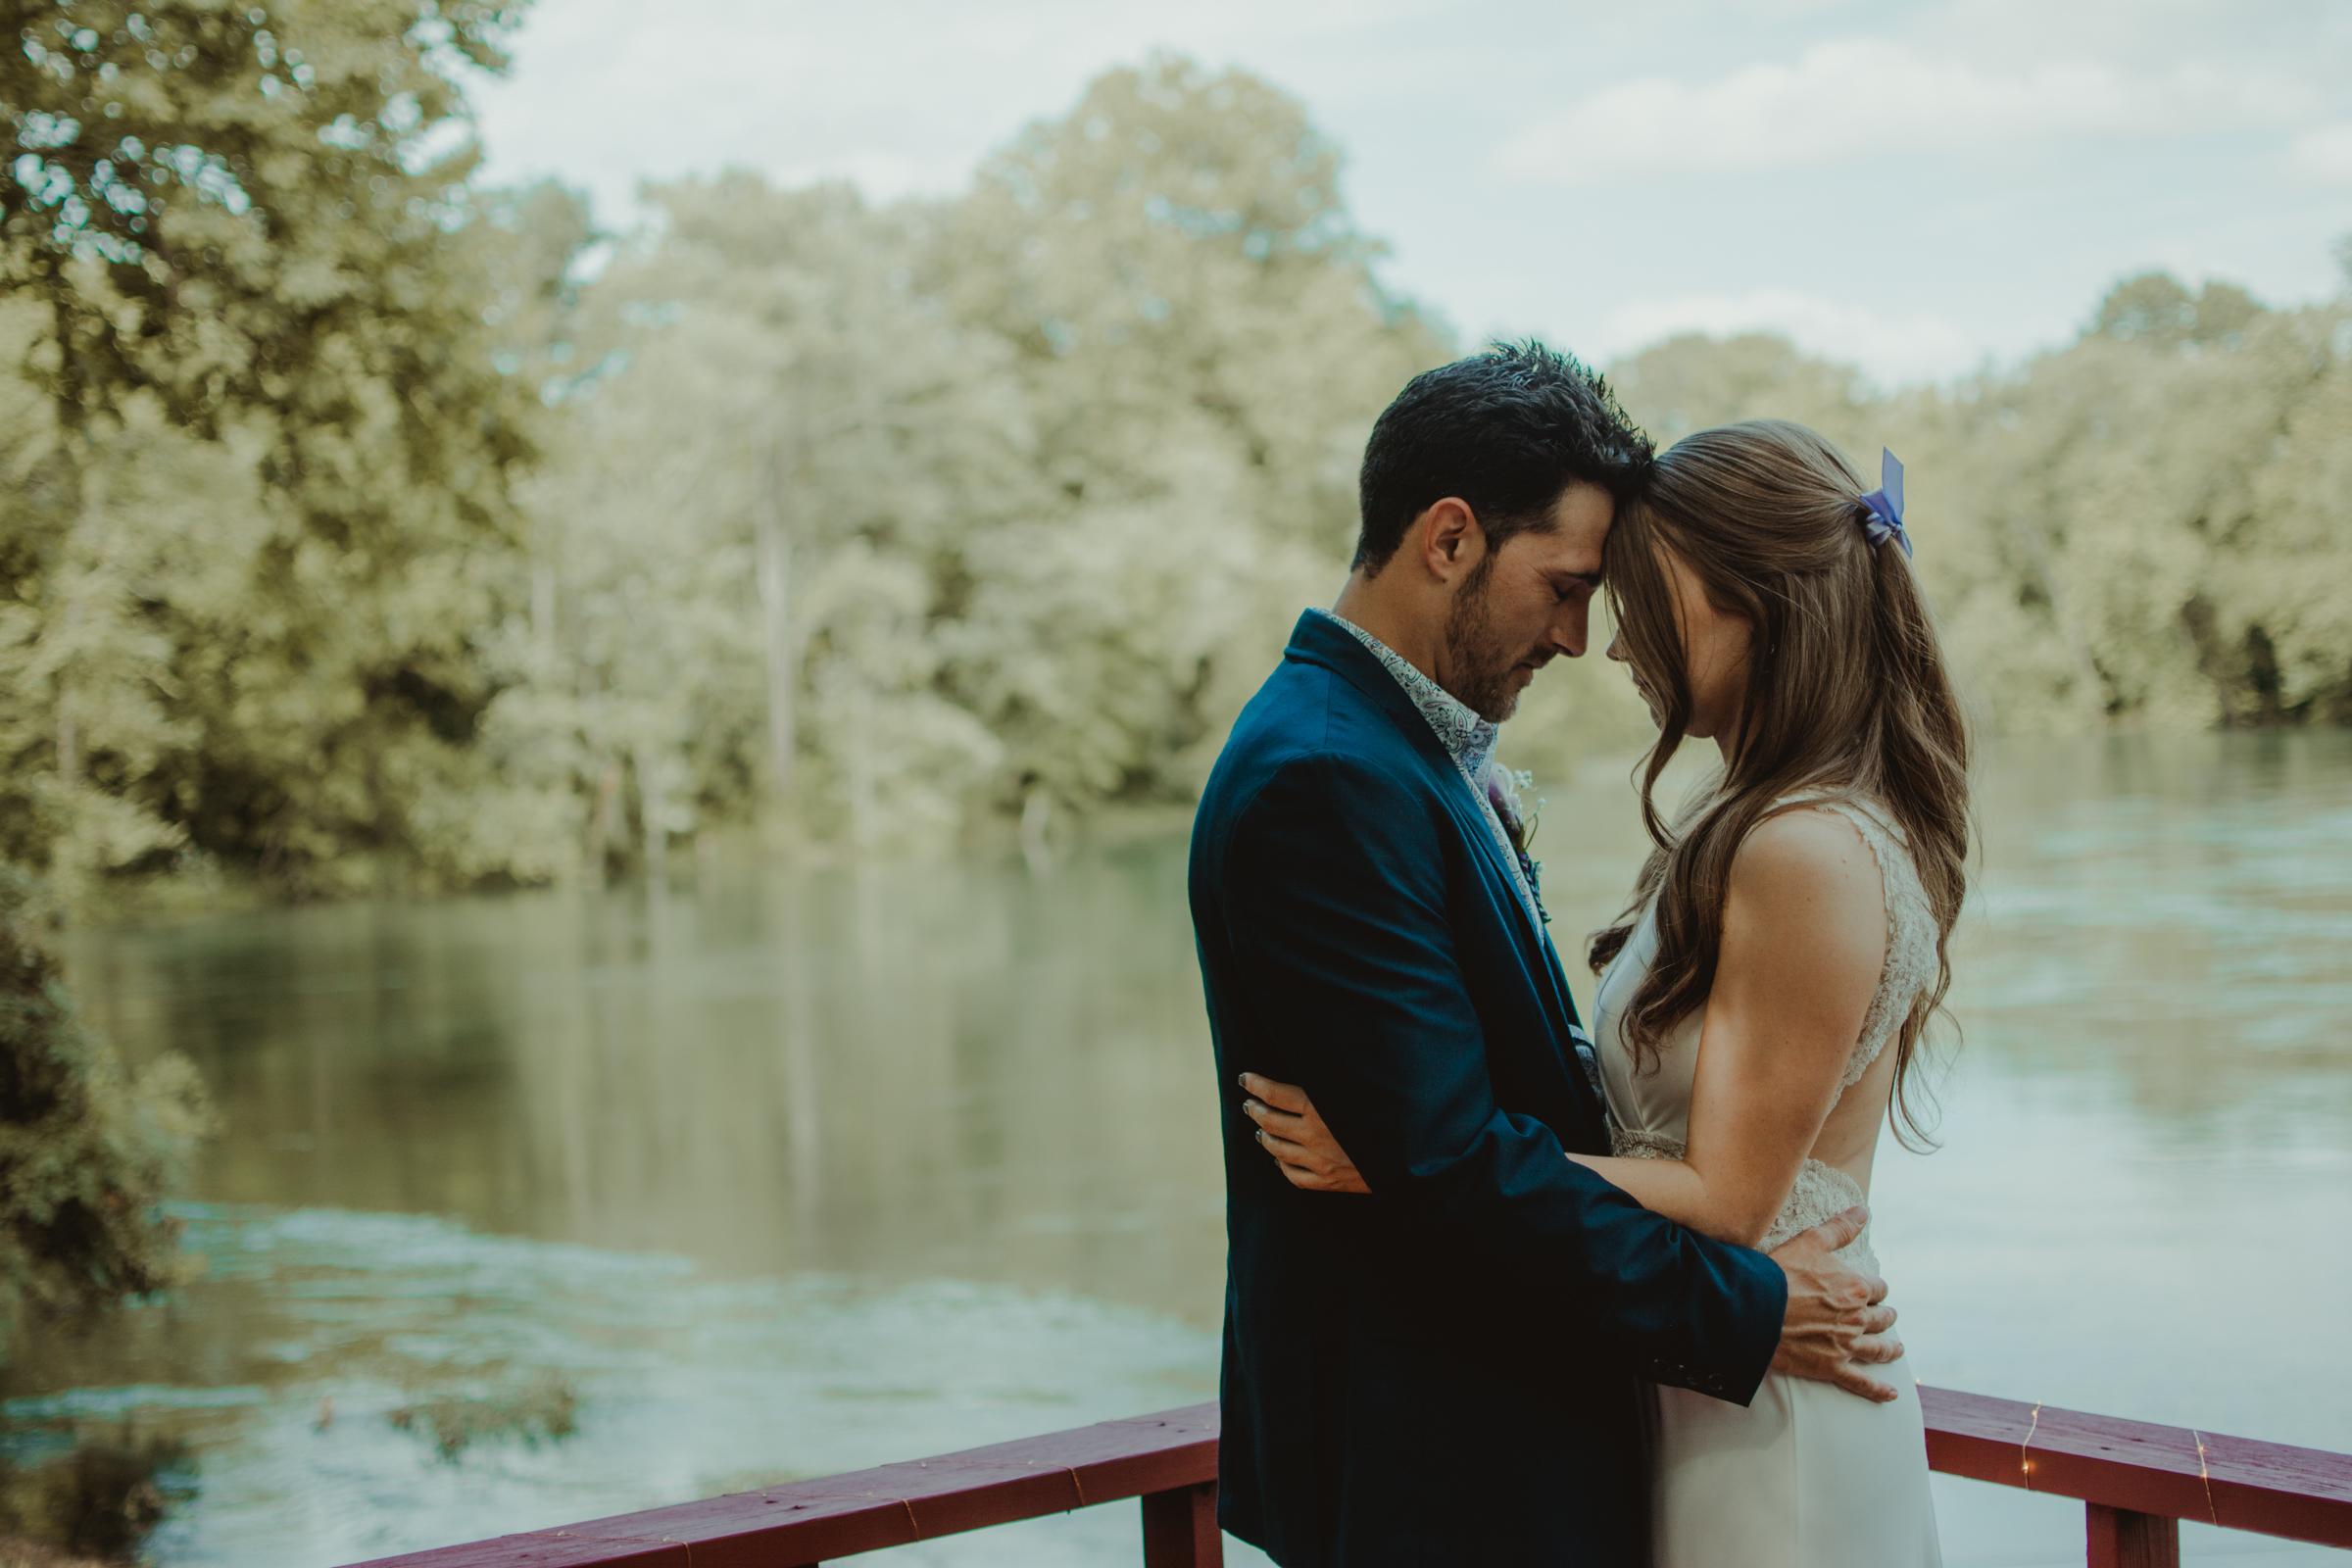 lake-house-wedding-layze-river-heber-springs-arkansas